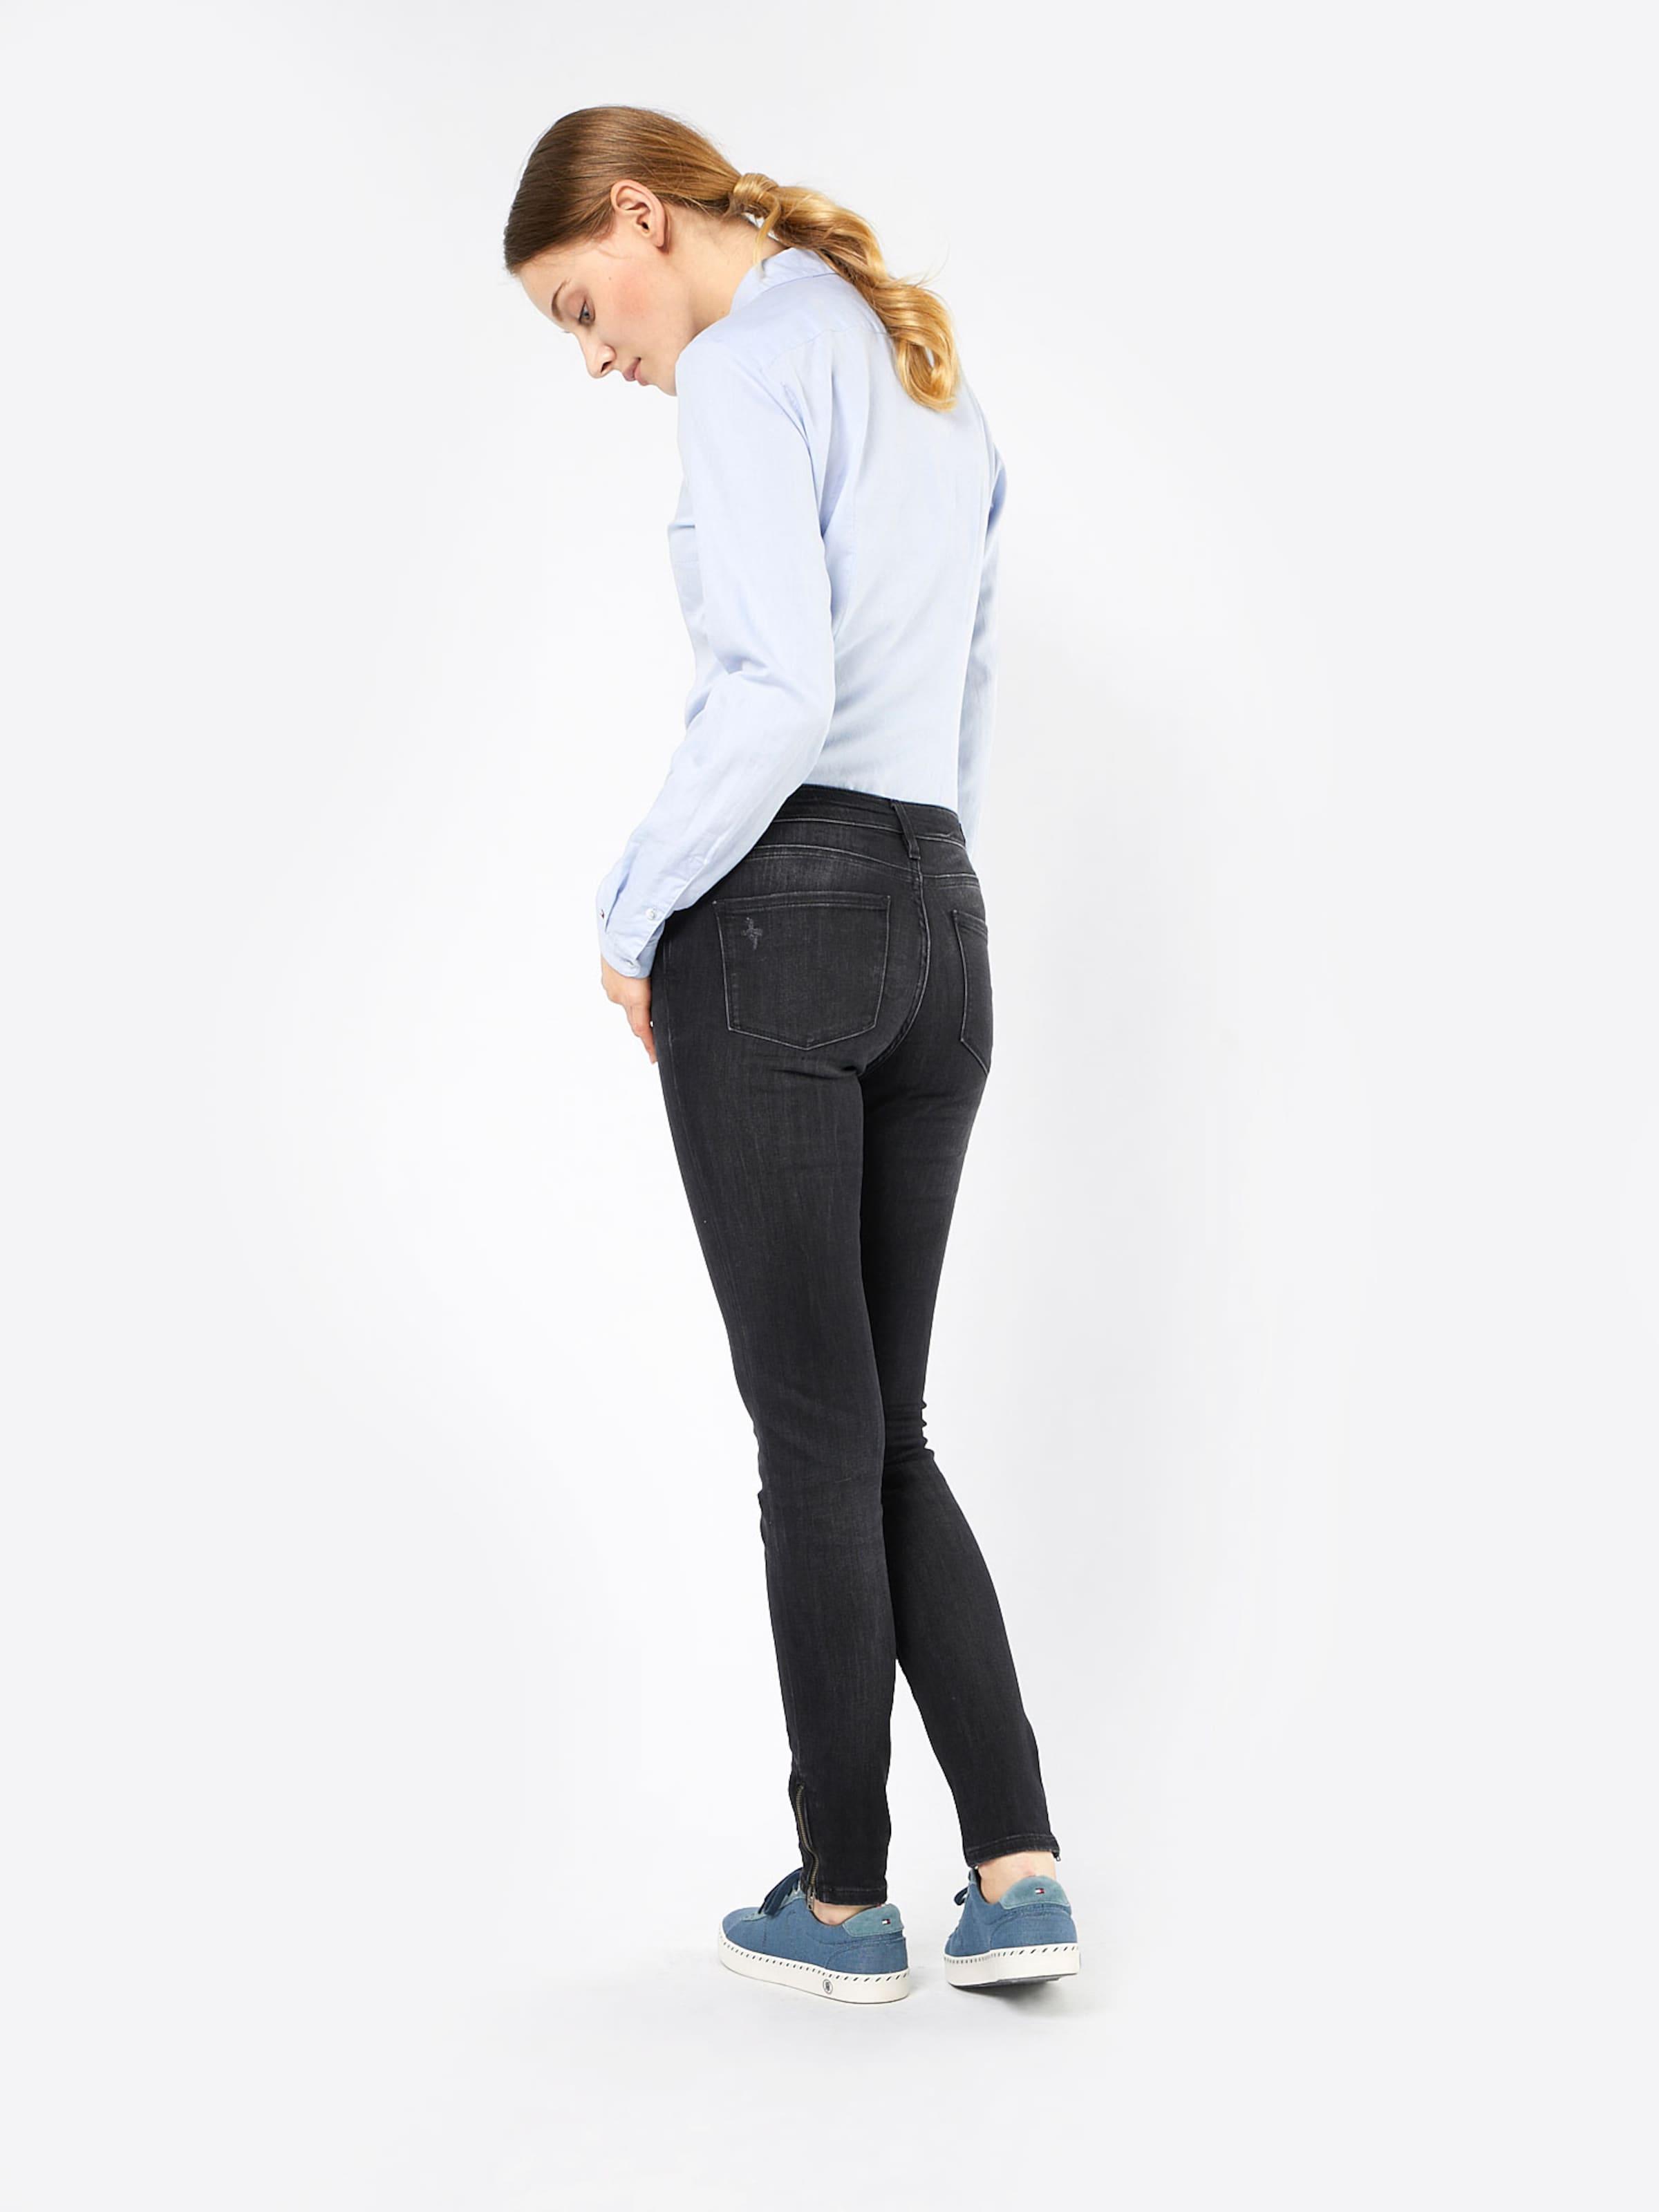 Freies Verschiffen Billig Billig Ausgezeichnet TOMMY HILFIGER Jeans 'MANOUK' Outlet Factory Outlet RoiHARalaL